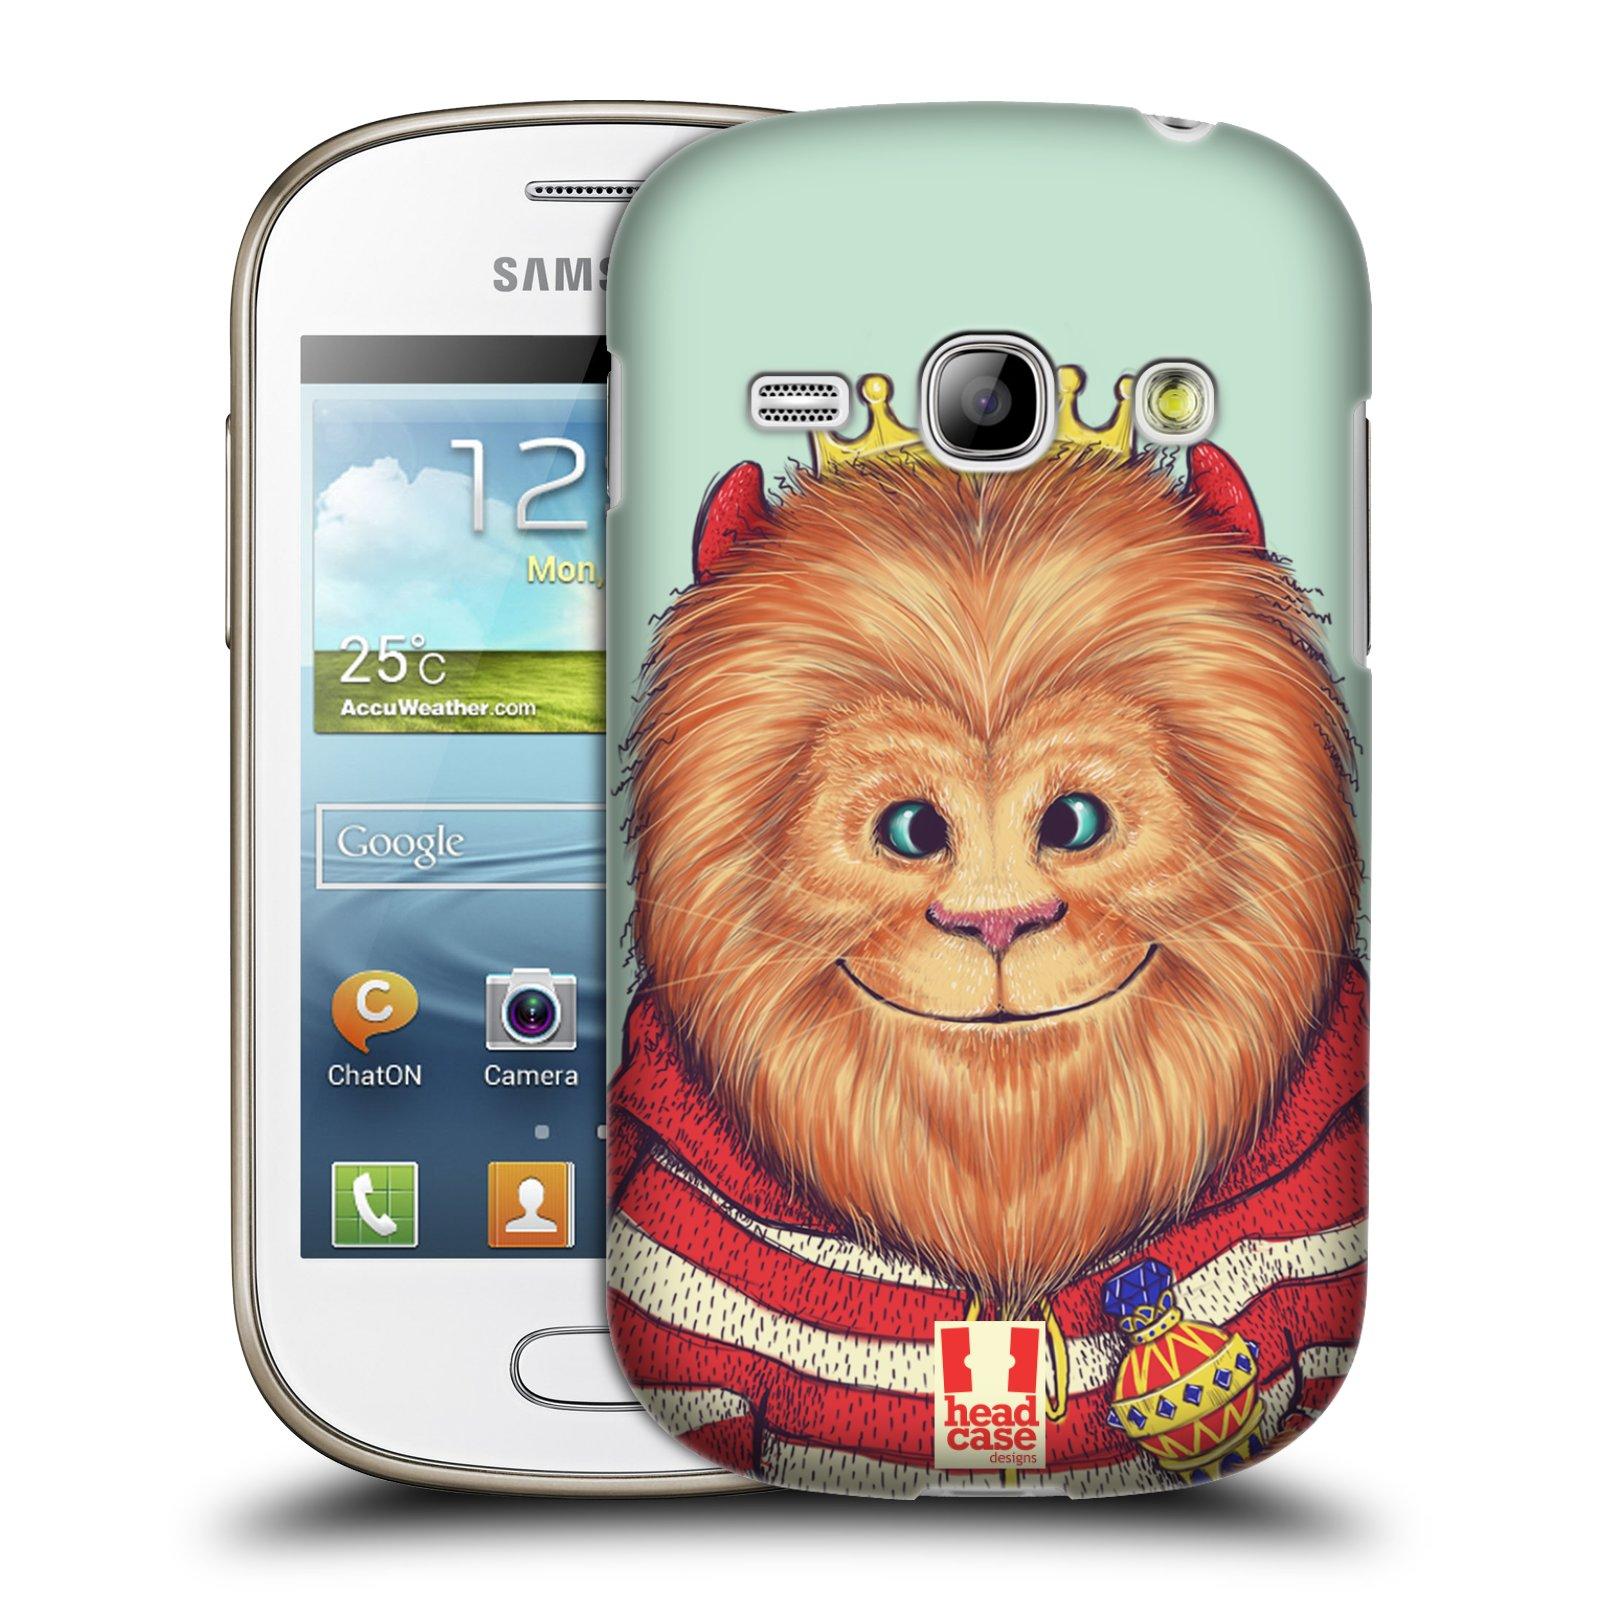 HEAD CASE plastový obal na mobil SAMSUNG GALAXY FAME (S6810) vzor Kreslená zvířátka lev